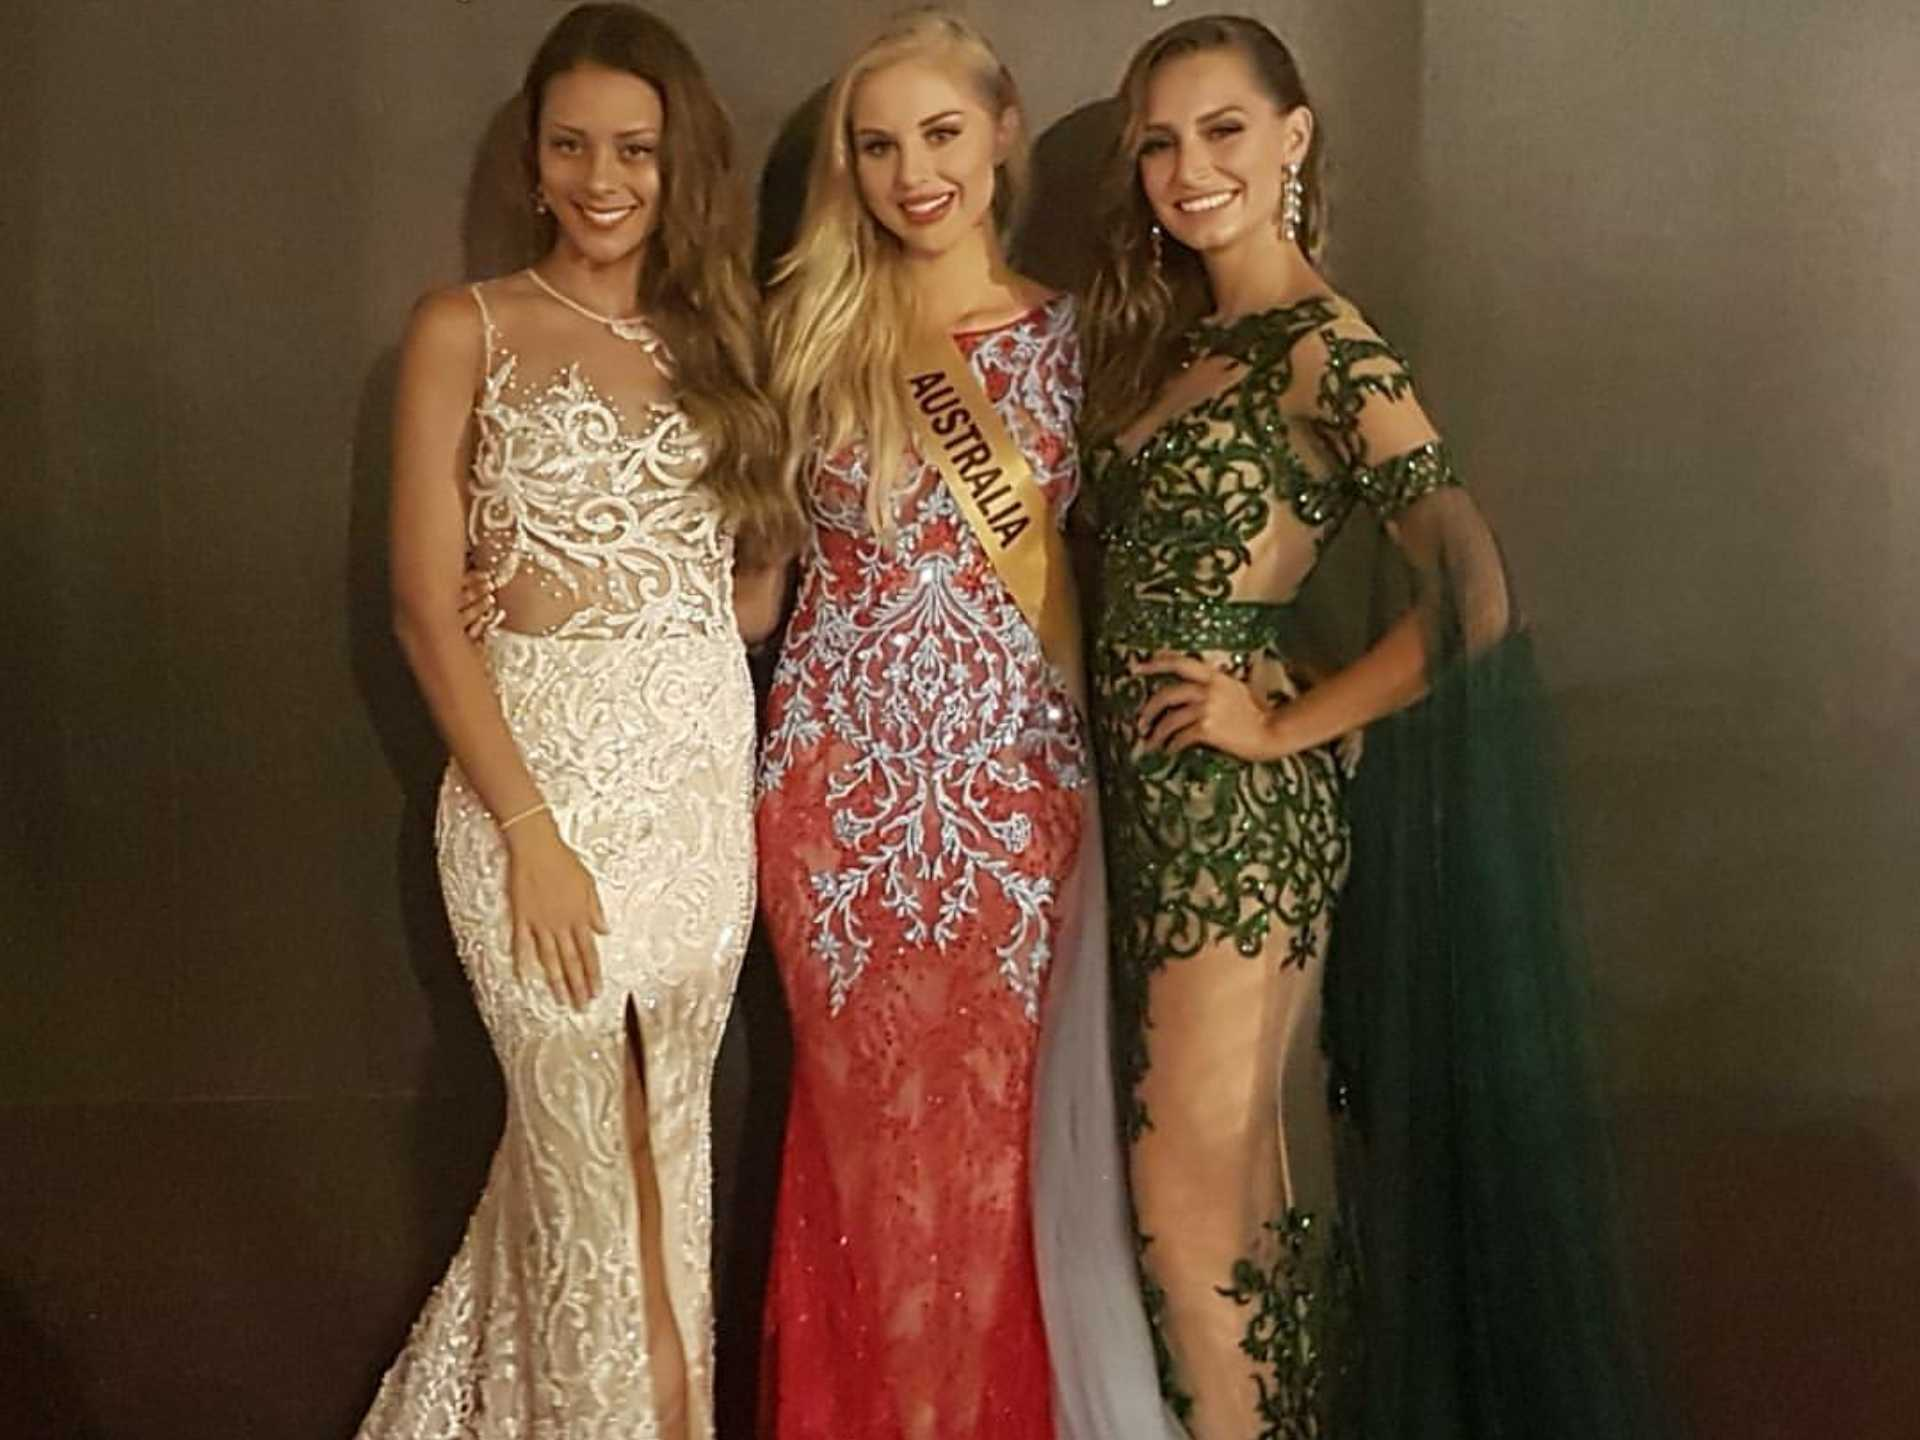 Claire Elizabeth Parker, Miss Grand International 2015 (kanan) bersama Miss Grand Australia 2017 (tengah) dan 2016 (kiri) kompak memakai gaun rancangan Anaz. (Sumber: Instagram/missgrandaustralia)